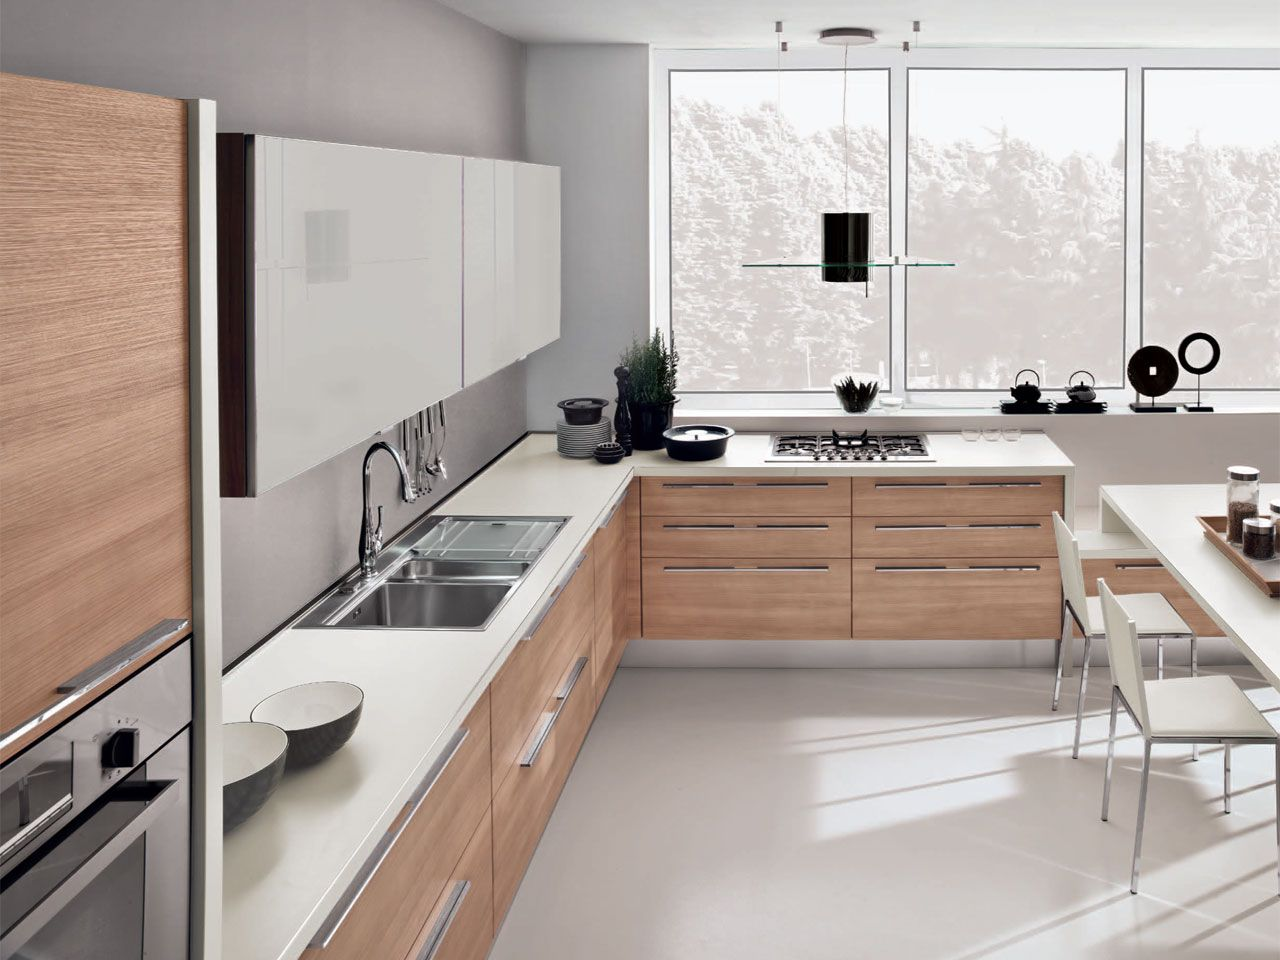 Noemi  Kitchens  Cucine Lube  Cucine openspace